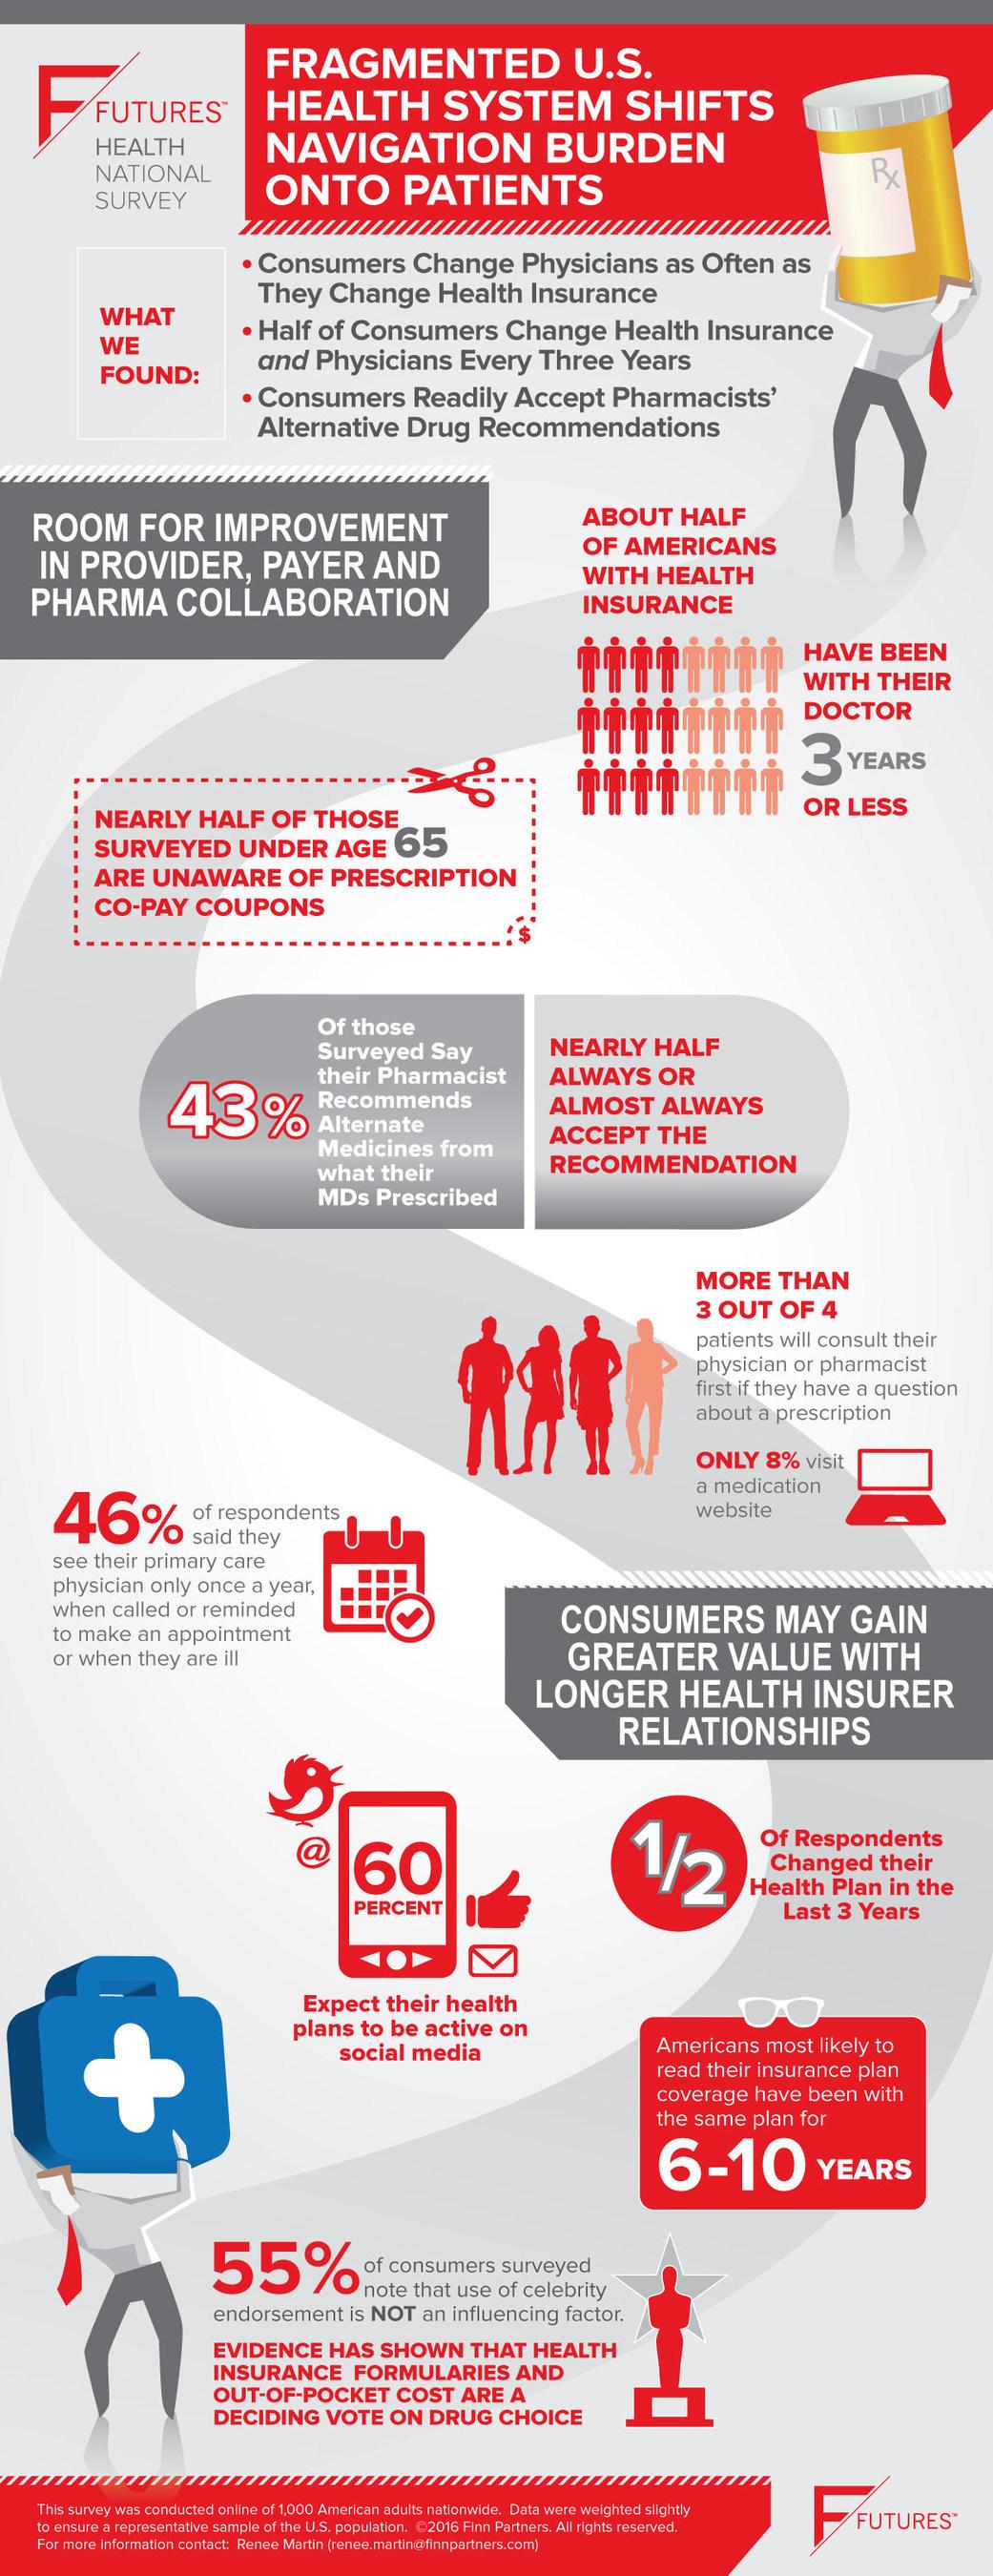 Fragmented U.S. Health System Shifts Navigation Burden onto Patients